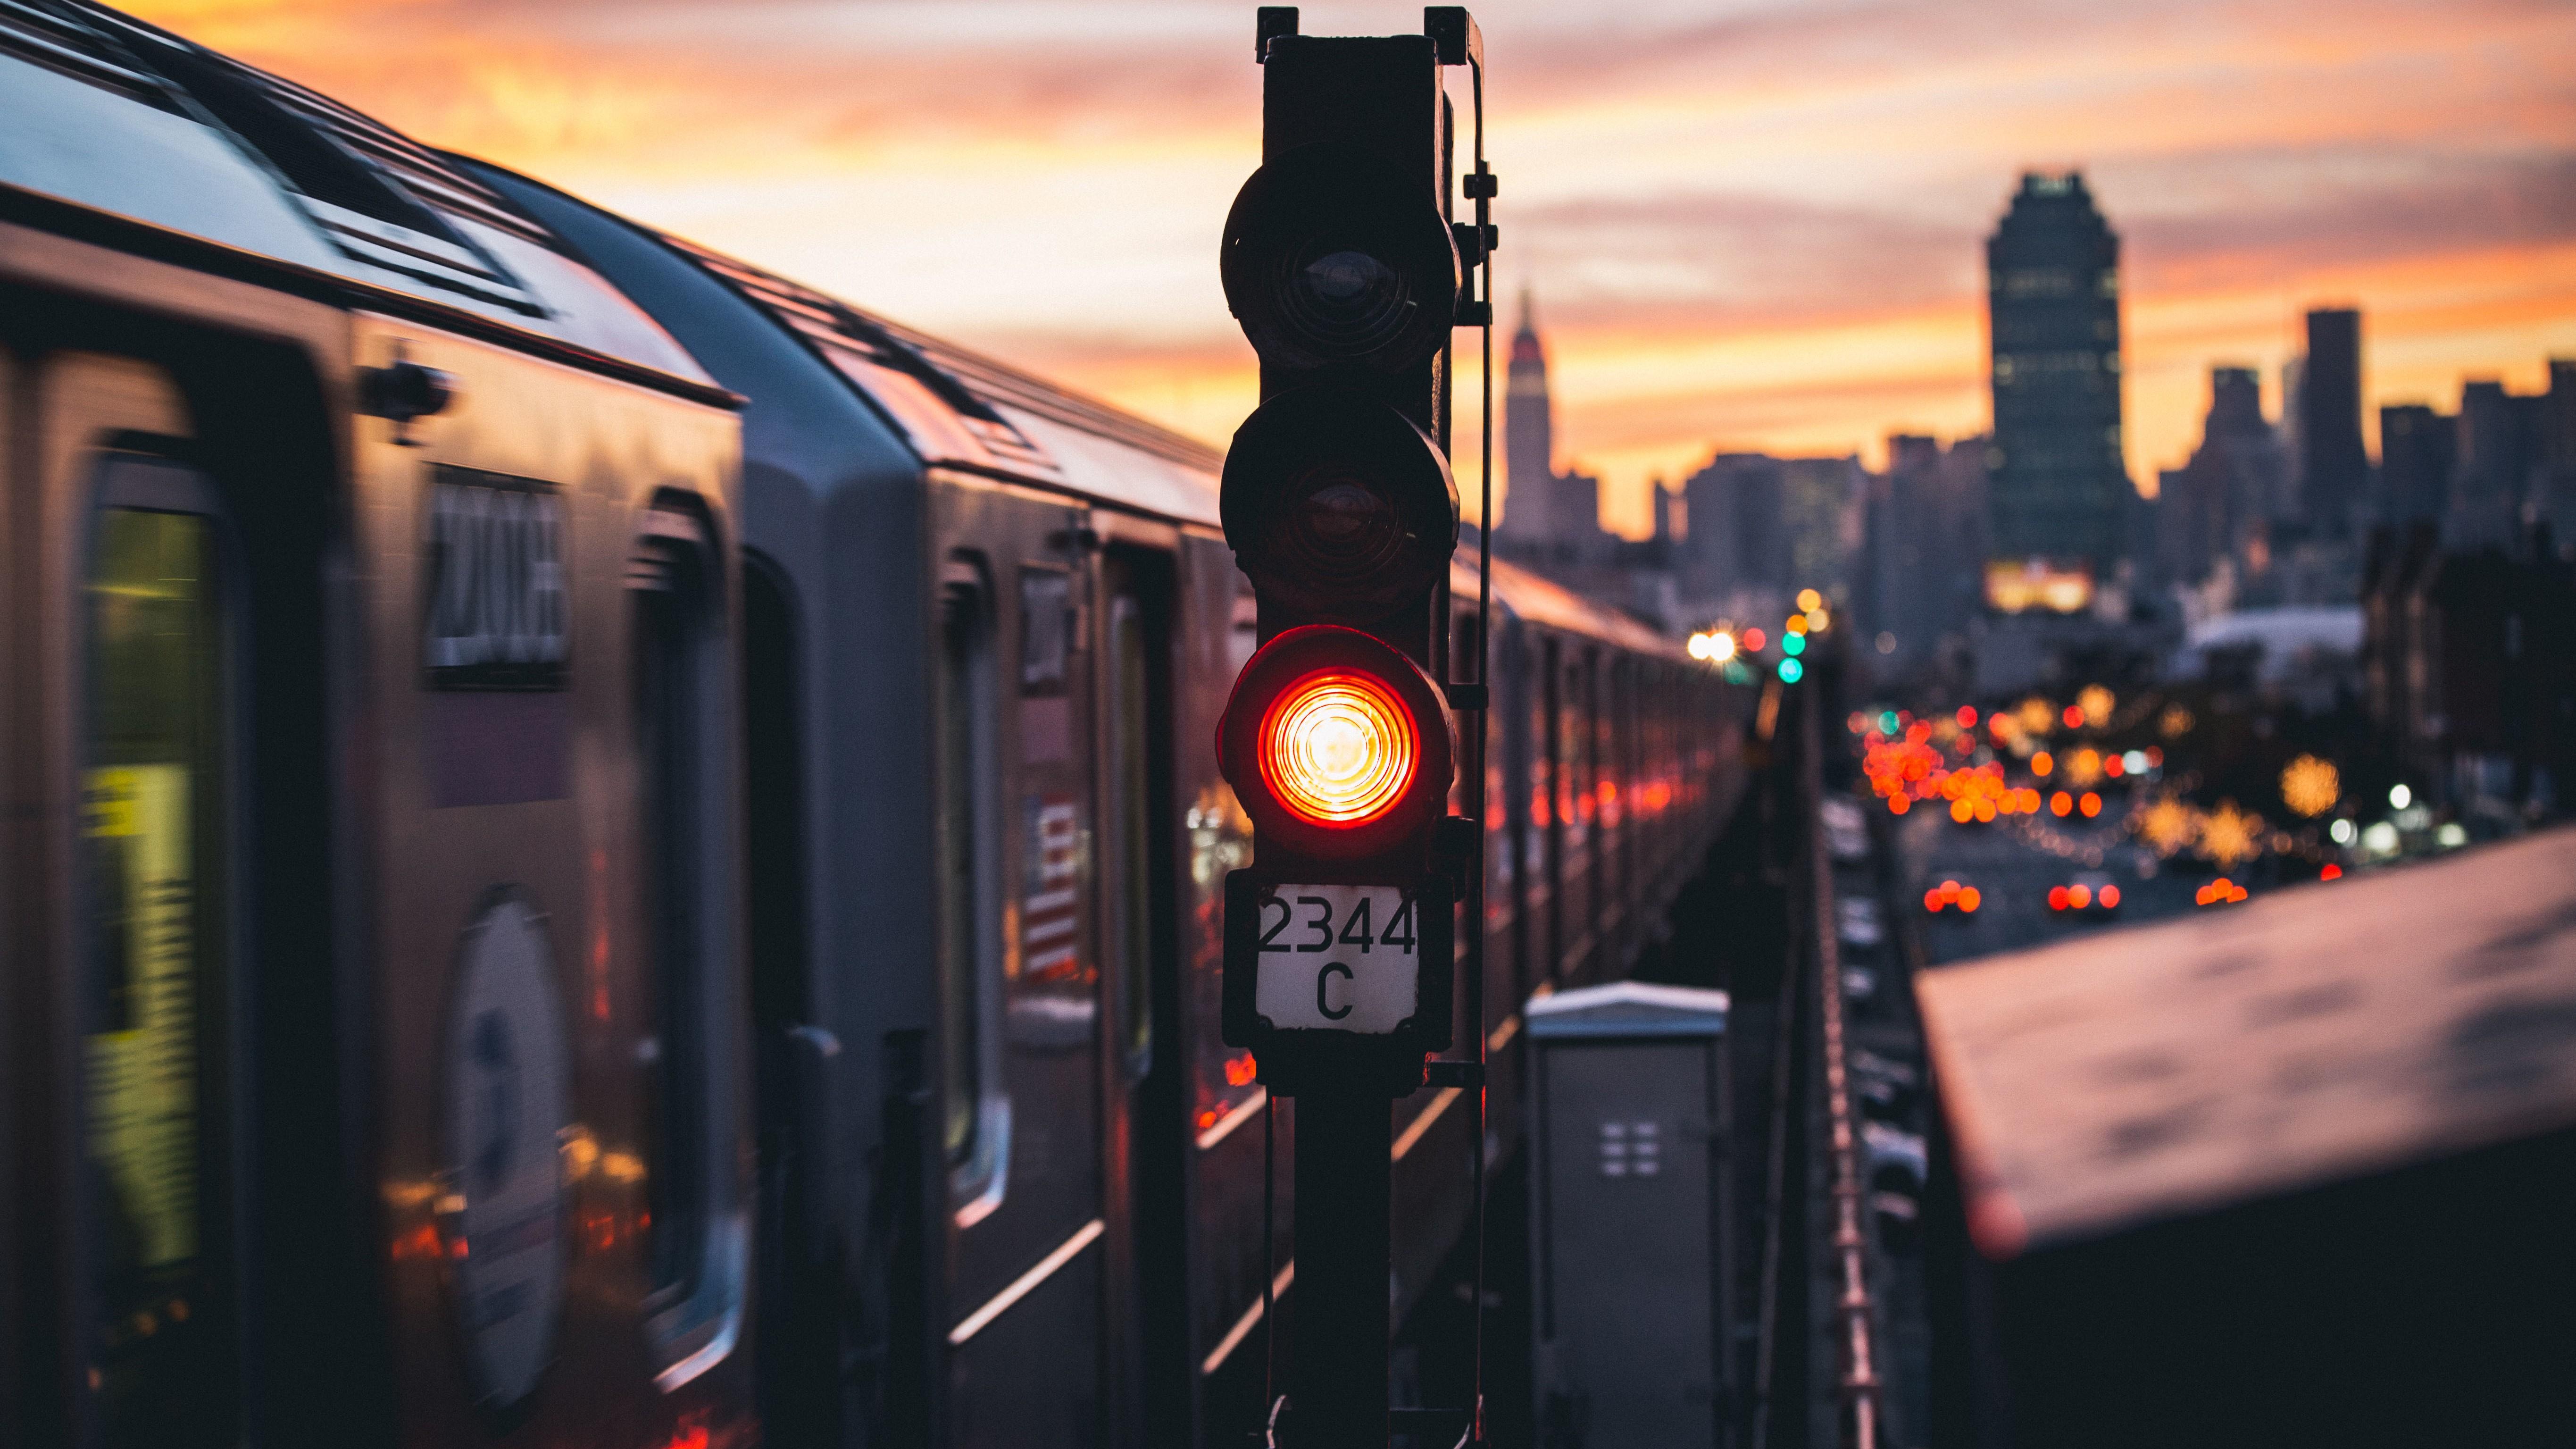 5120x2880 photography city train new york city urban 5k hd